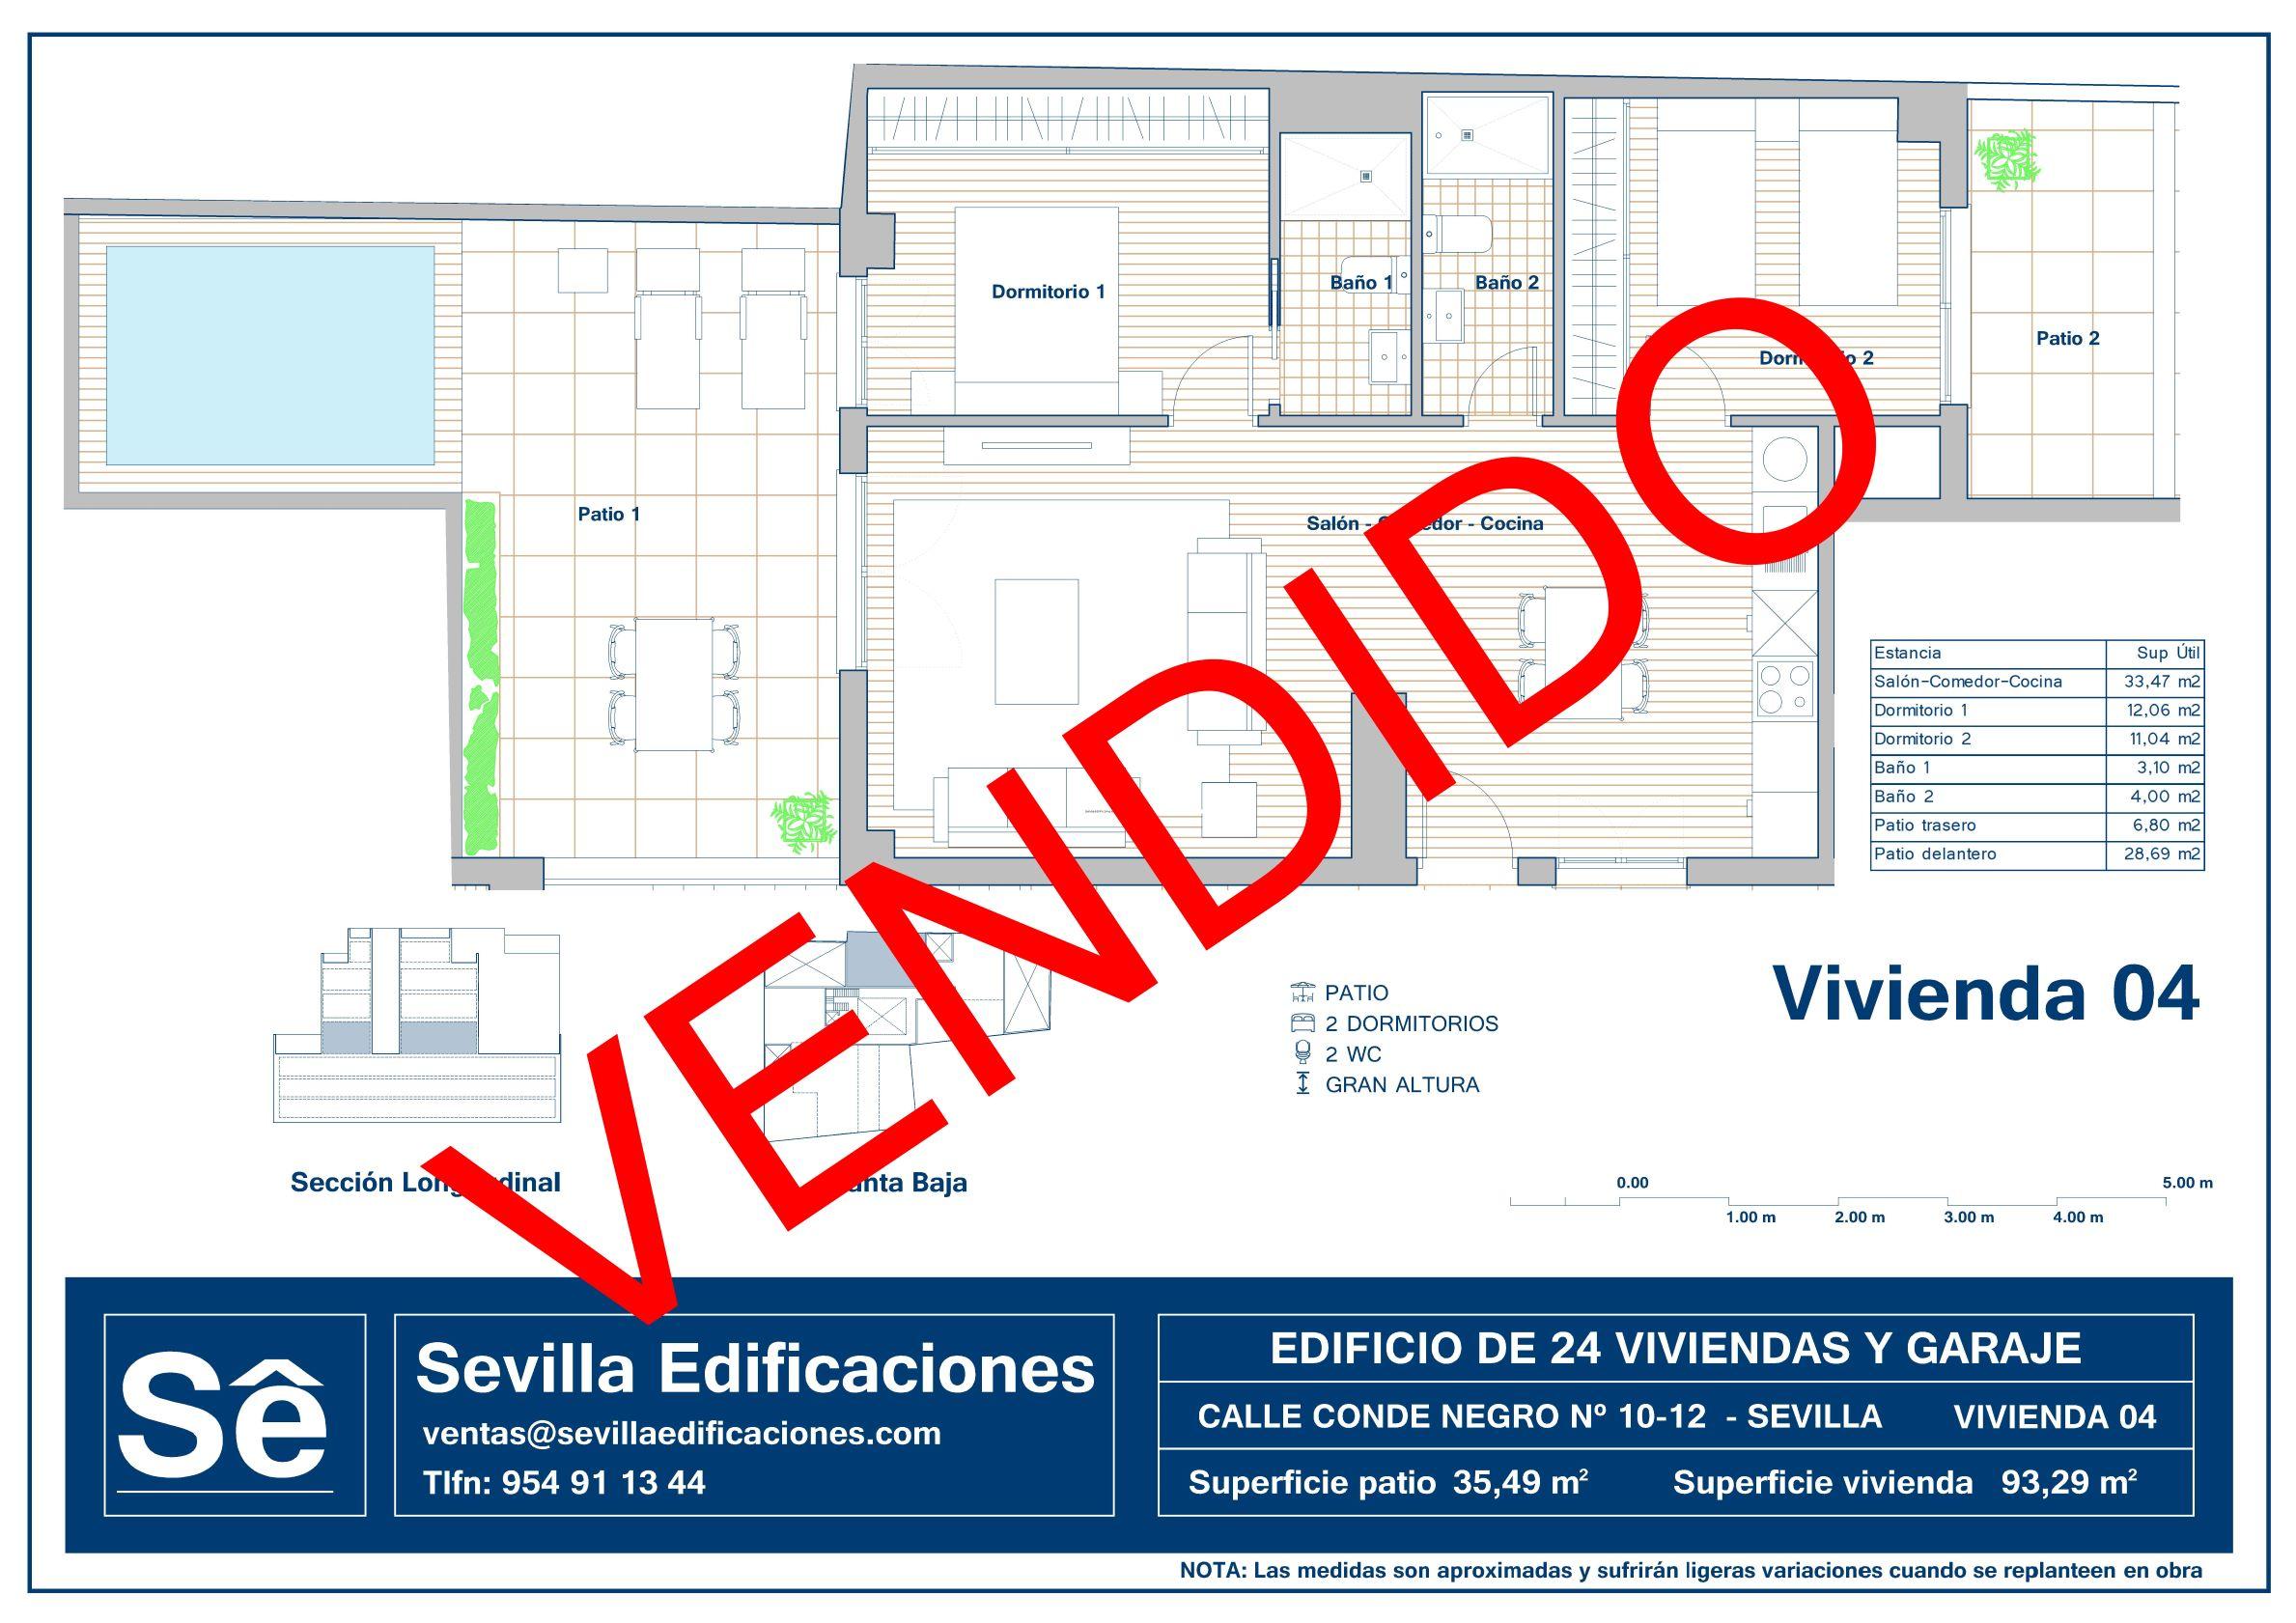 CONDENEGRO_VIVIENDA_04_VENDIDO